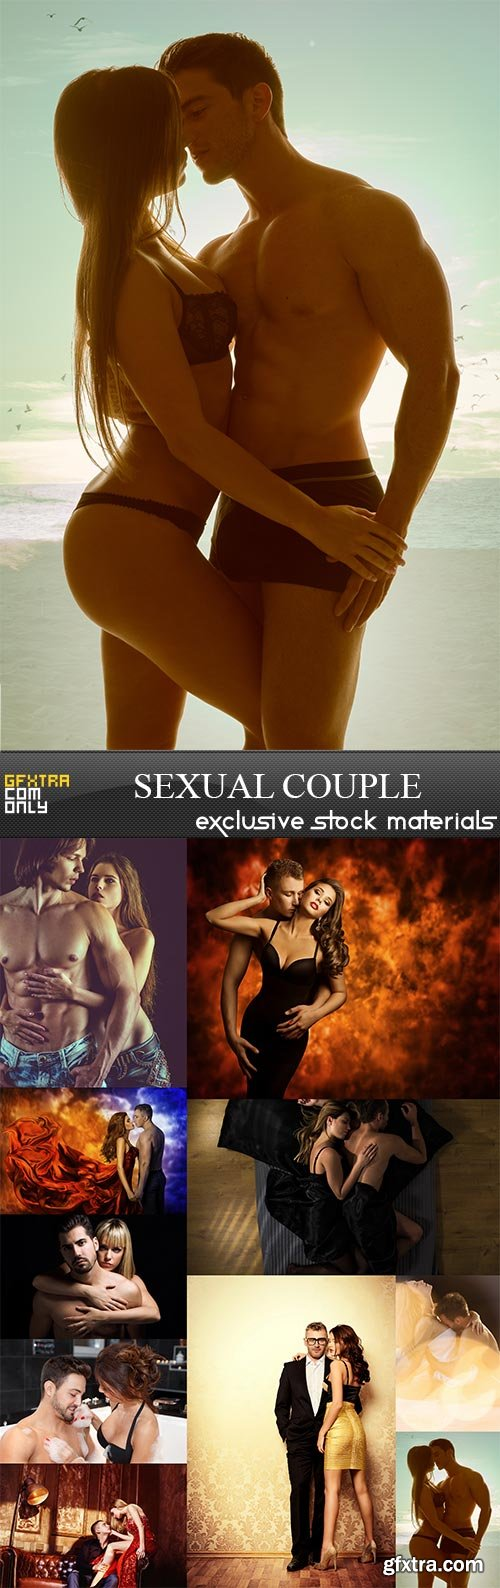 Sexual Couple, 10 x UHQ JPEG